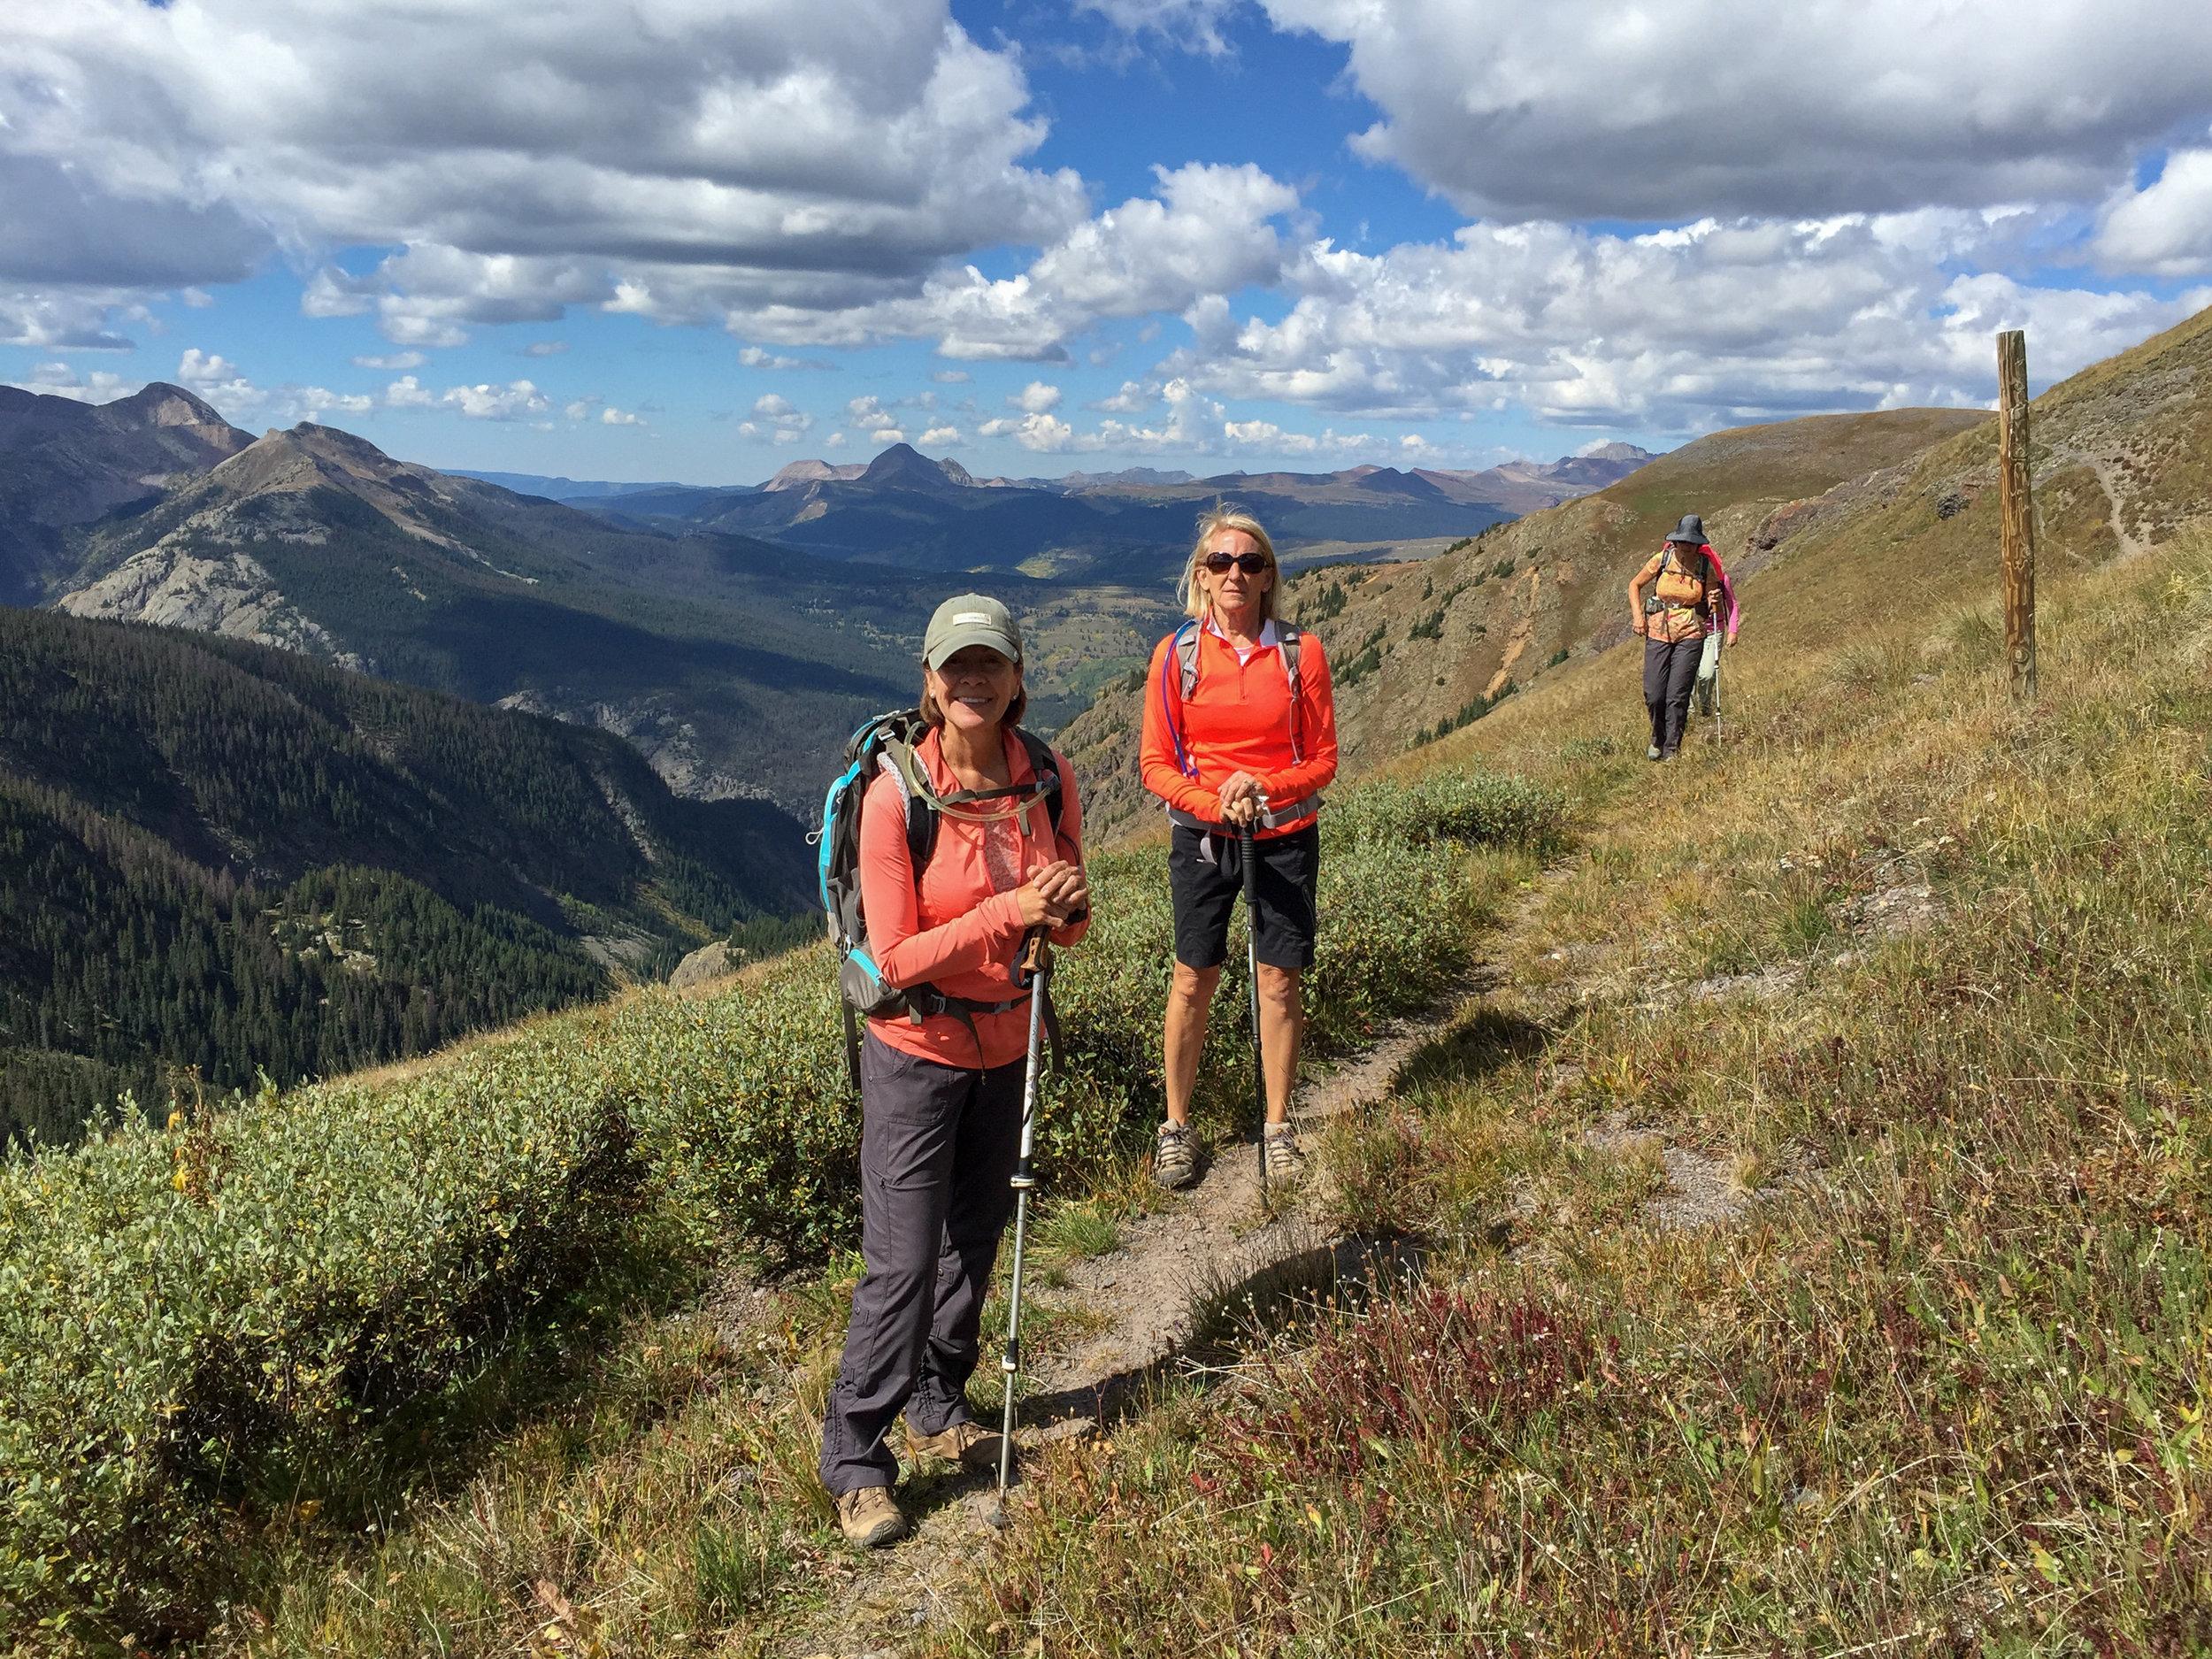 Angela, Mary & Gina on the trail